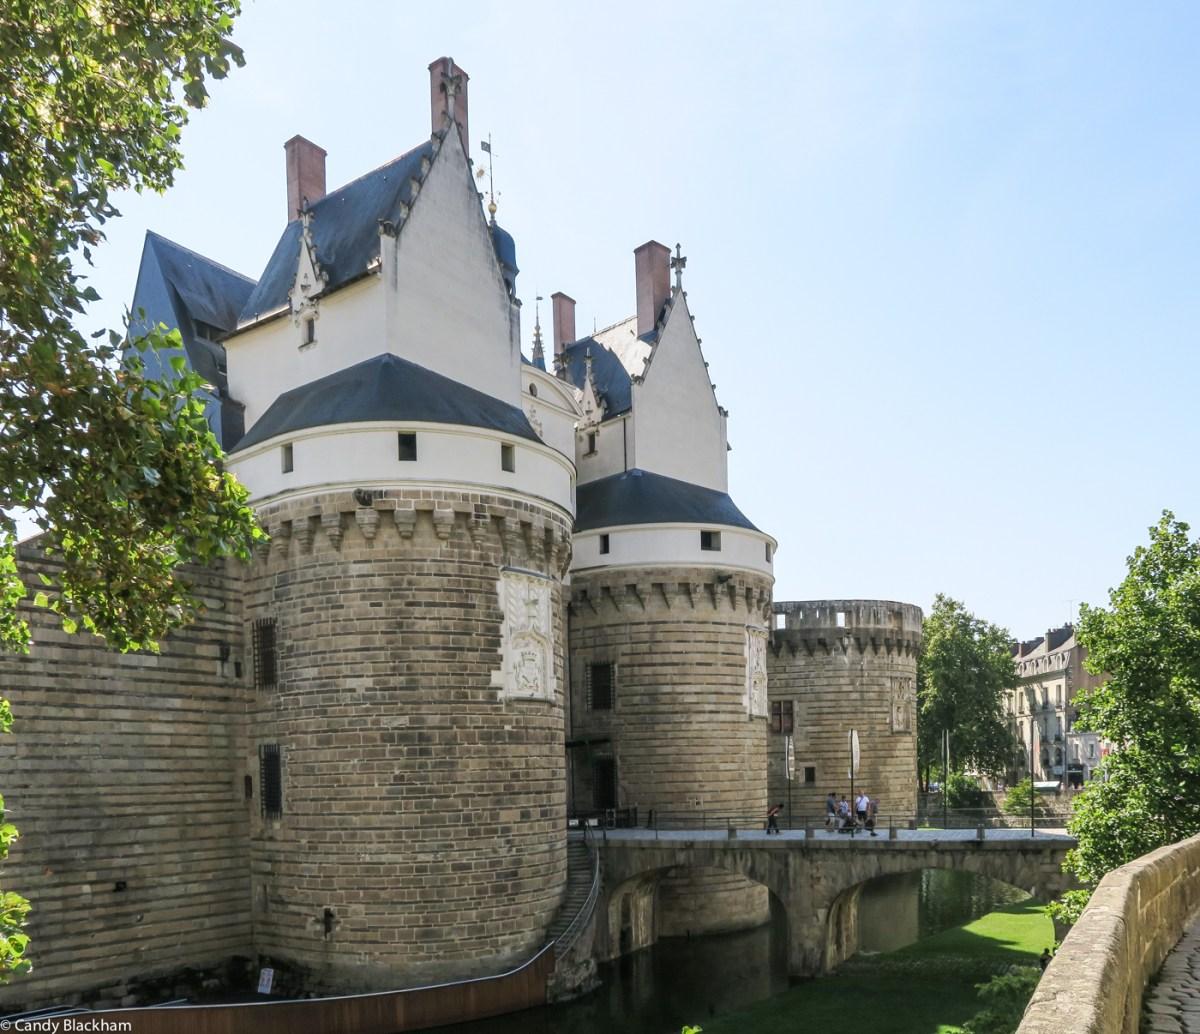 The Ducal Palace, Nantes